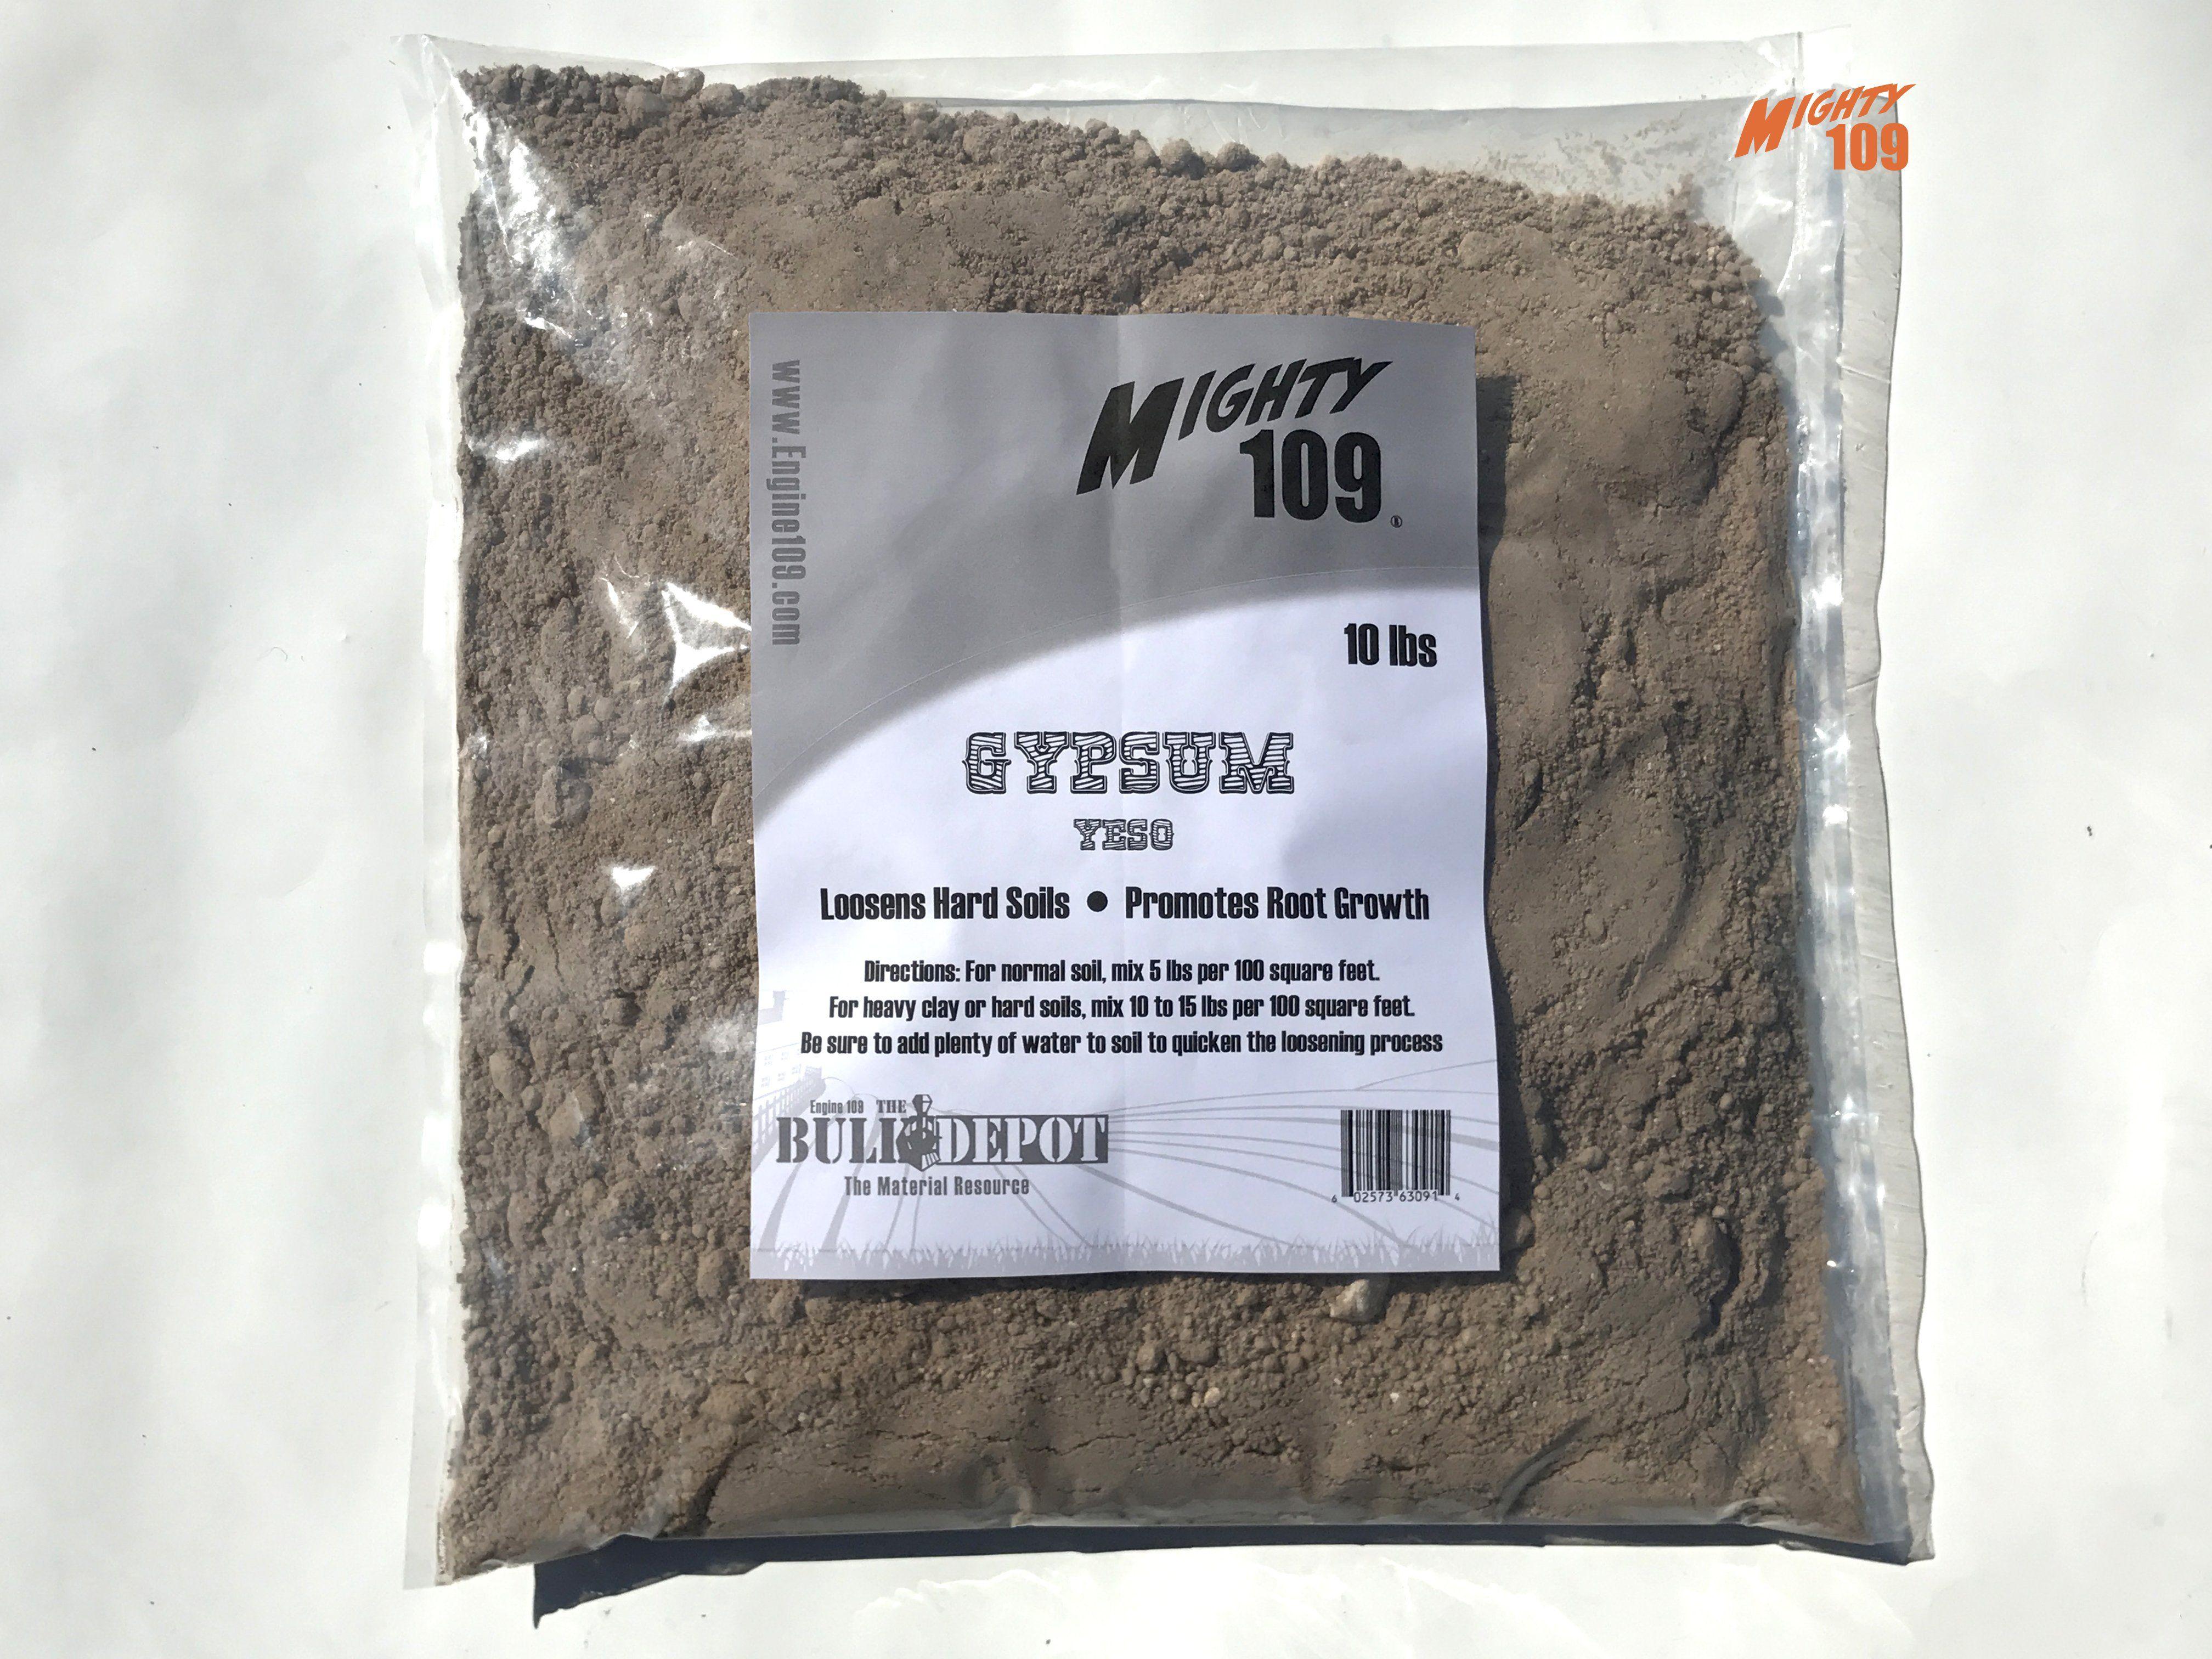 MIGHTY 109 Gypsum Yeso, Garden Soil Softener, 10 LBS